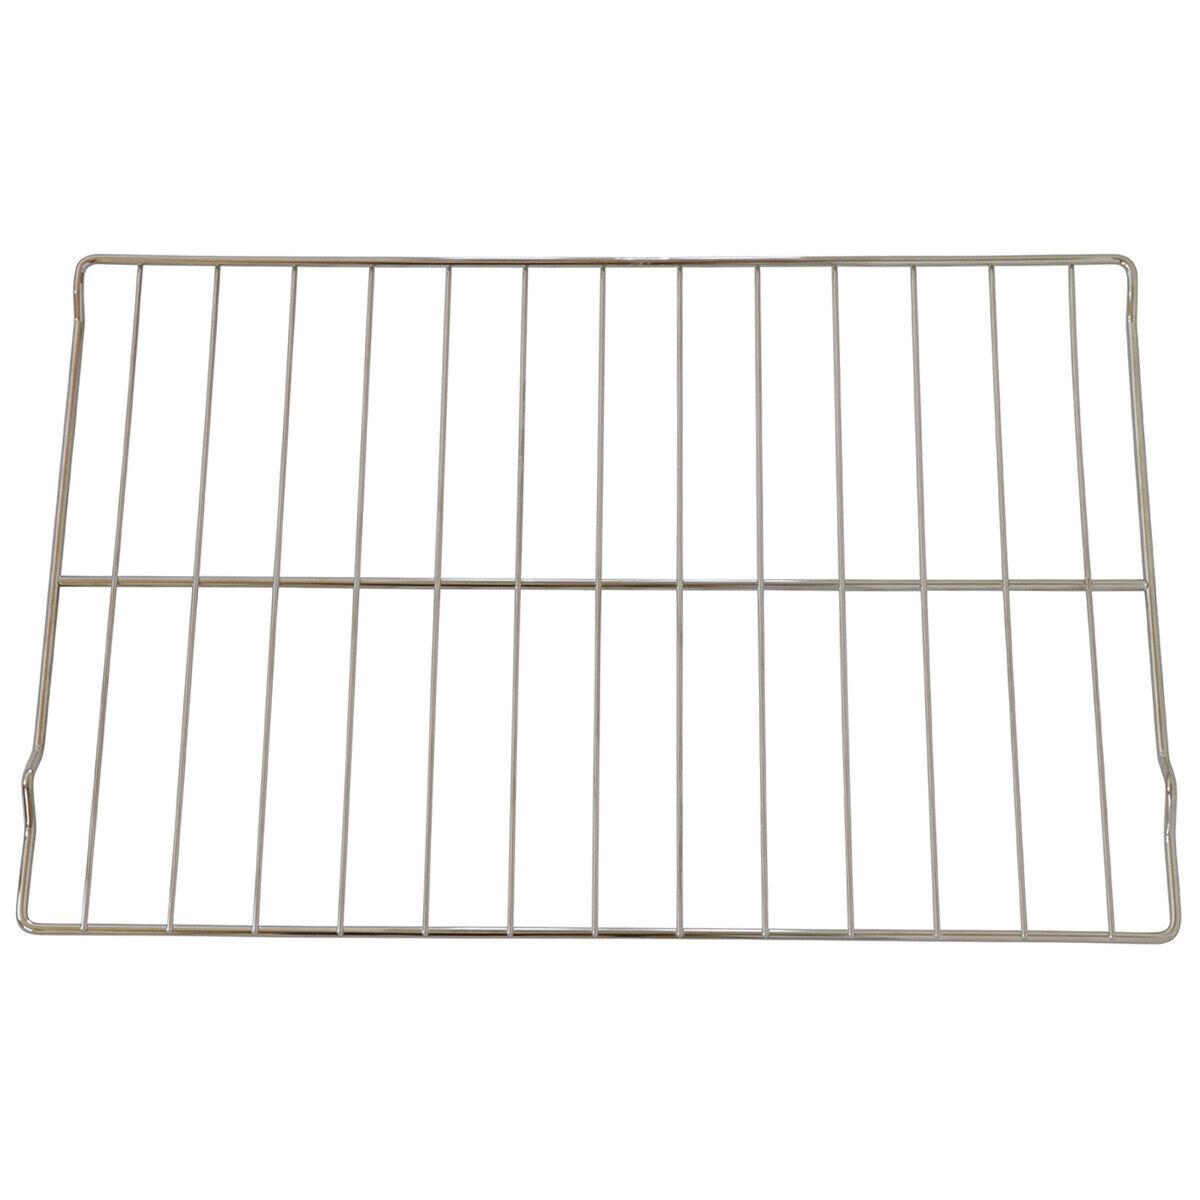 Kitchen Basics 101: W10256908 Oven Rack  Whirlpool Range 24 x 15.7